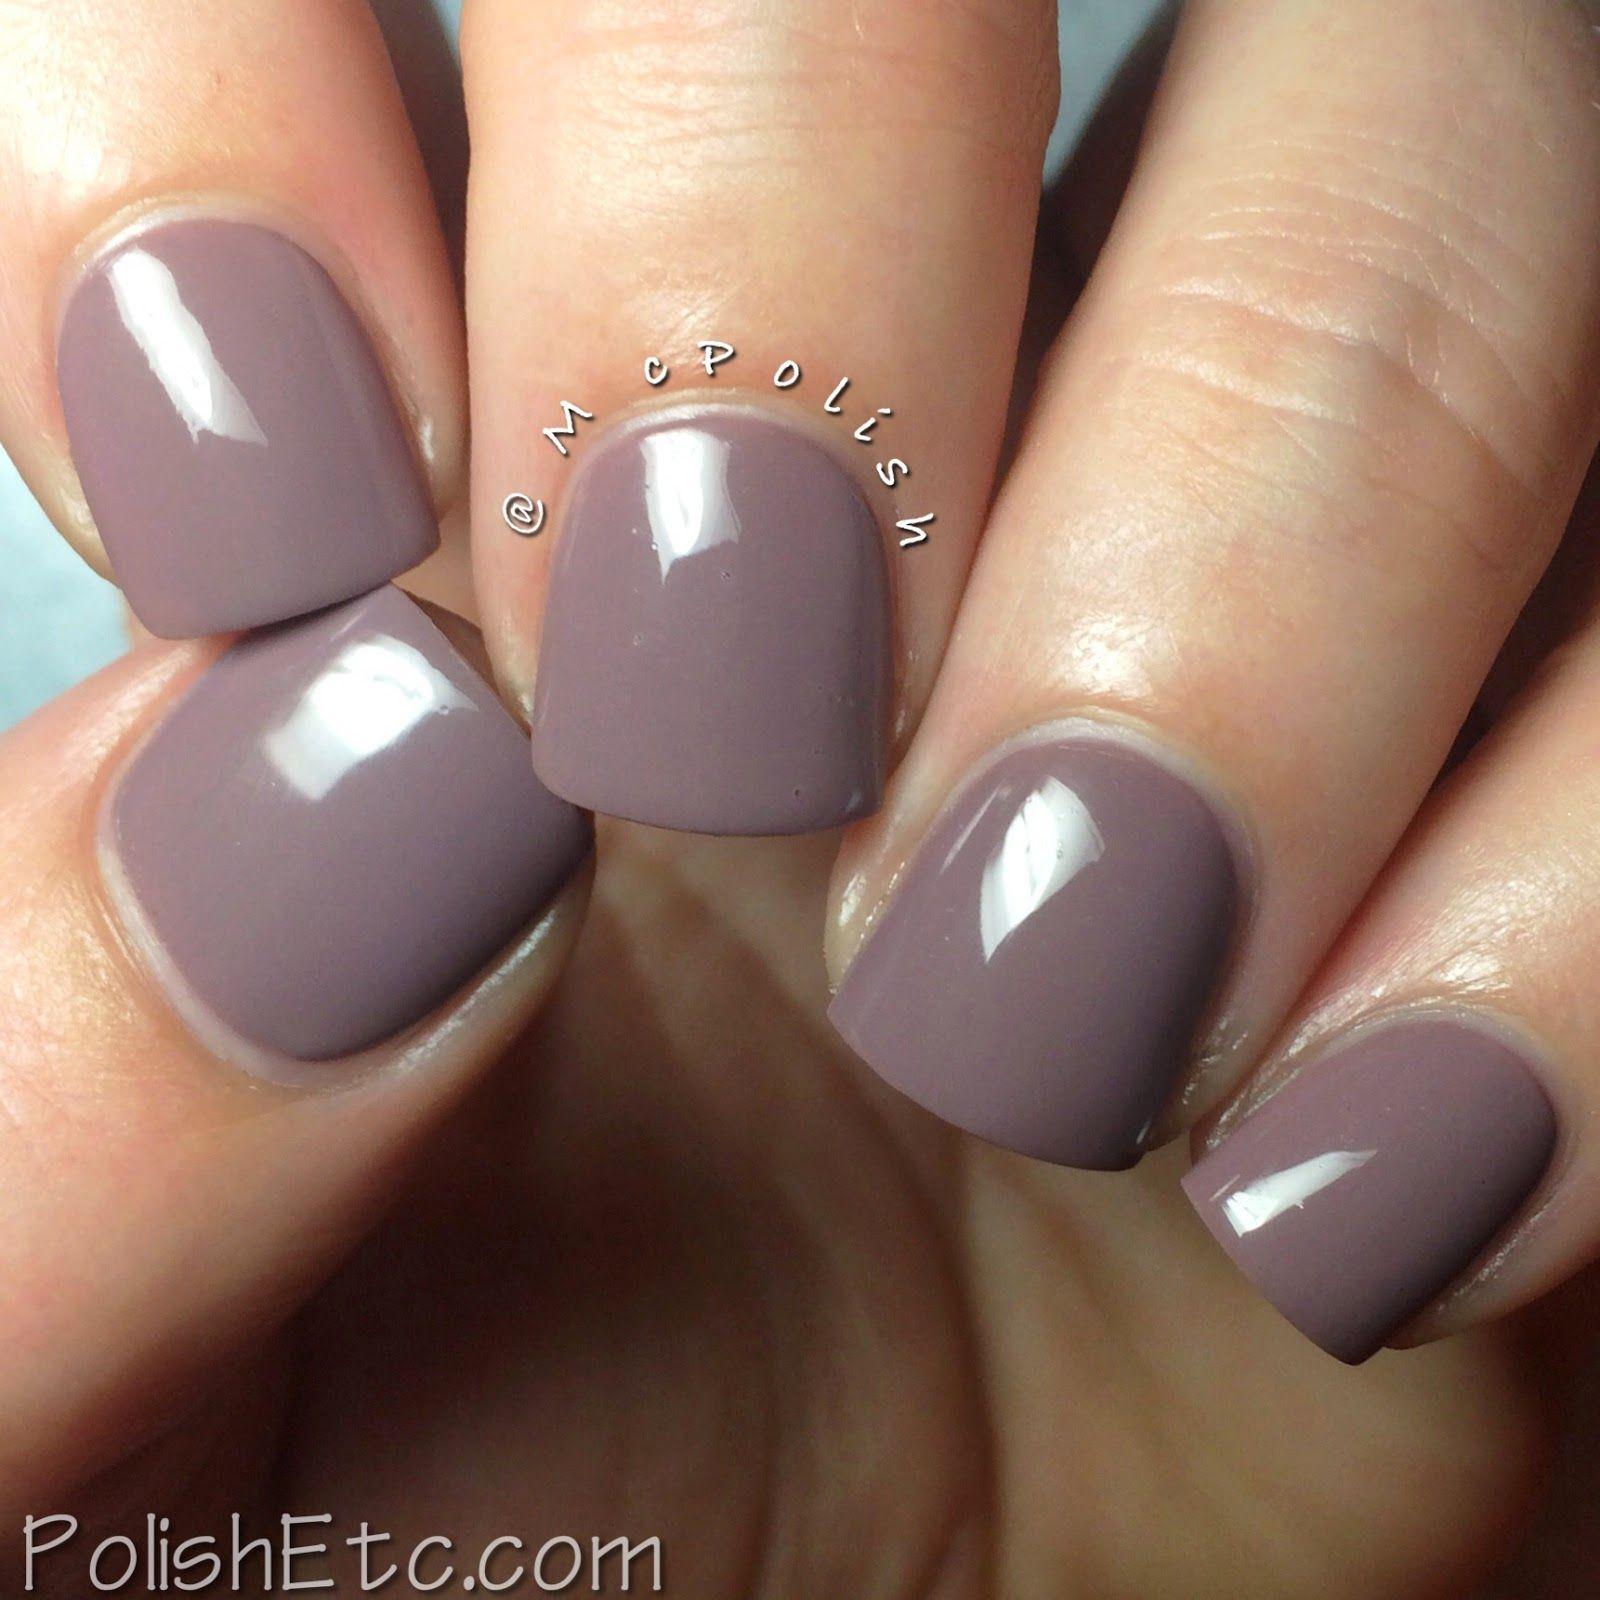 Tillie Polish Glamorous Collection Mcpolish Posh Sns Nails